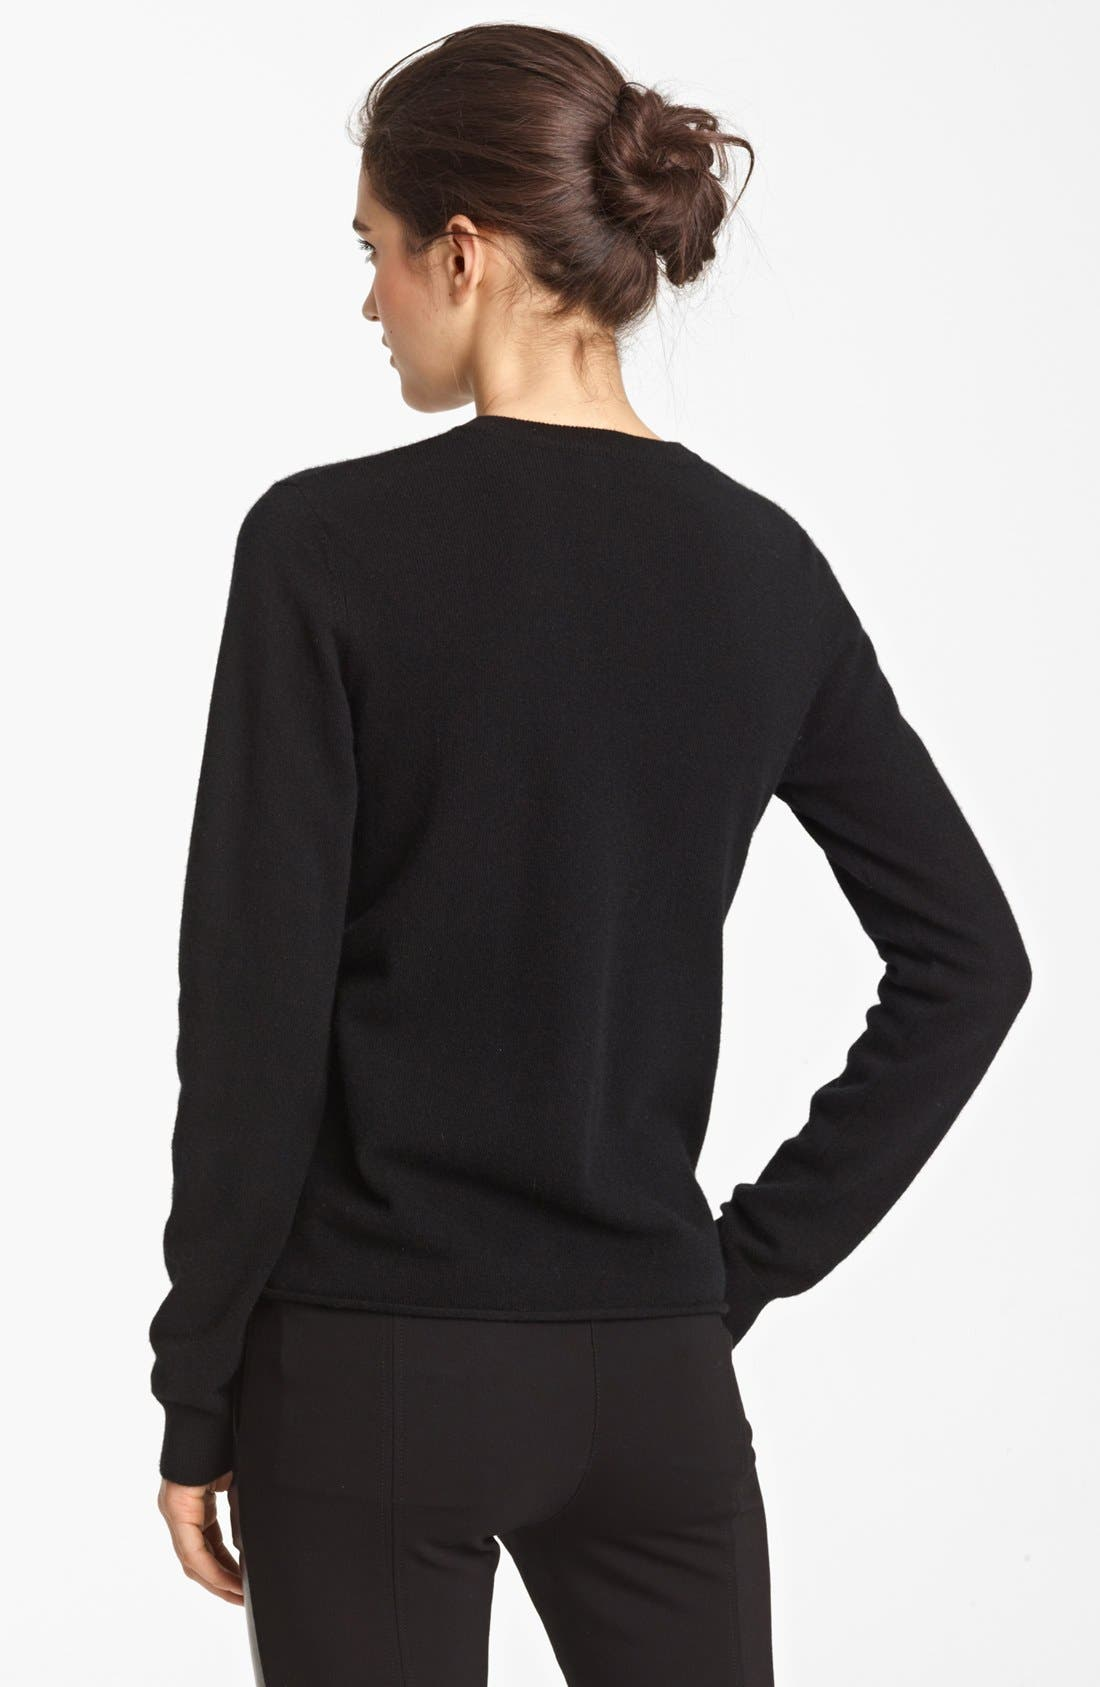 Cheap & Chic Graphic Cashmere Sweater,                             Alternate thumbnail 2, color,                             Black